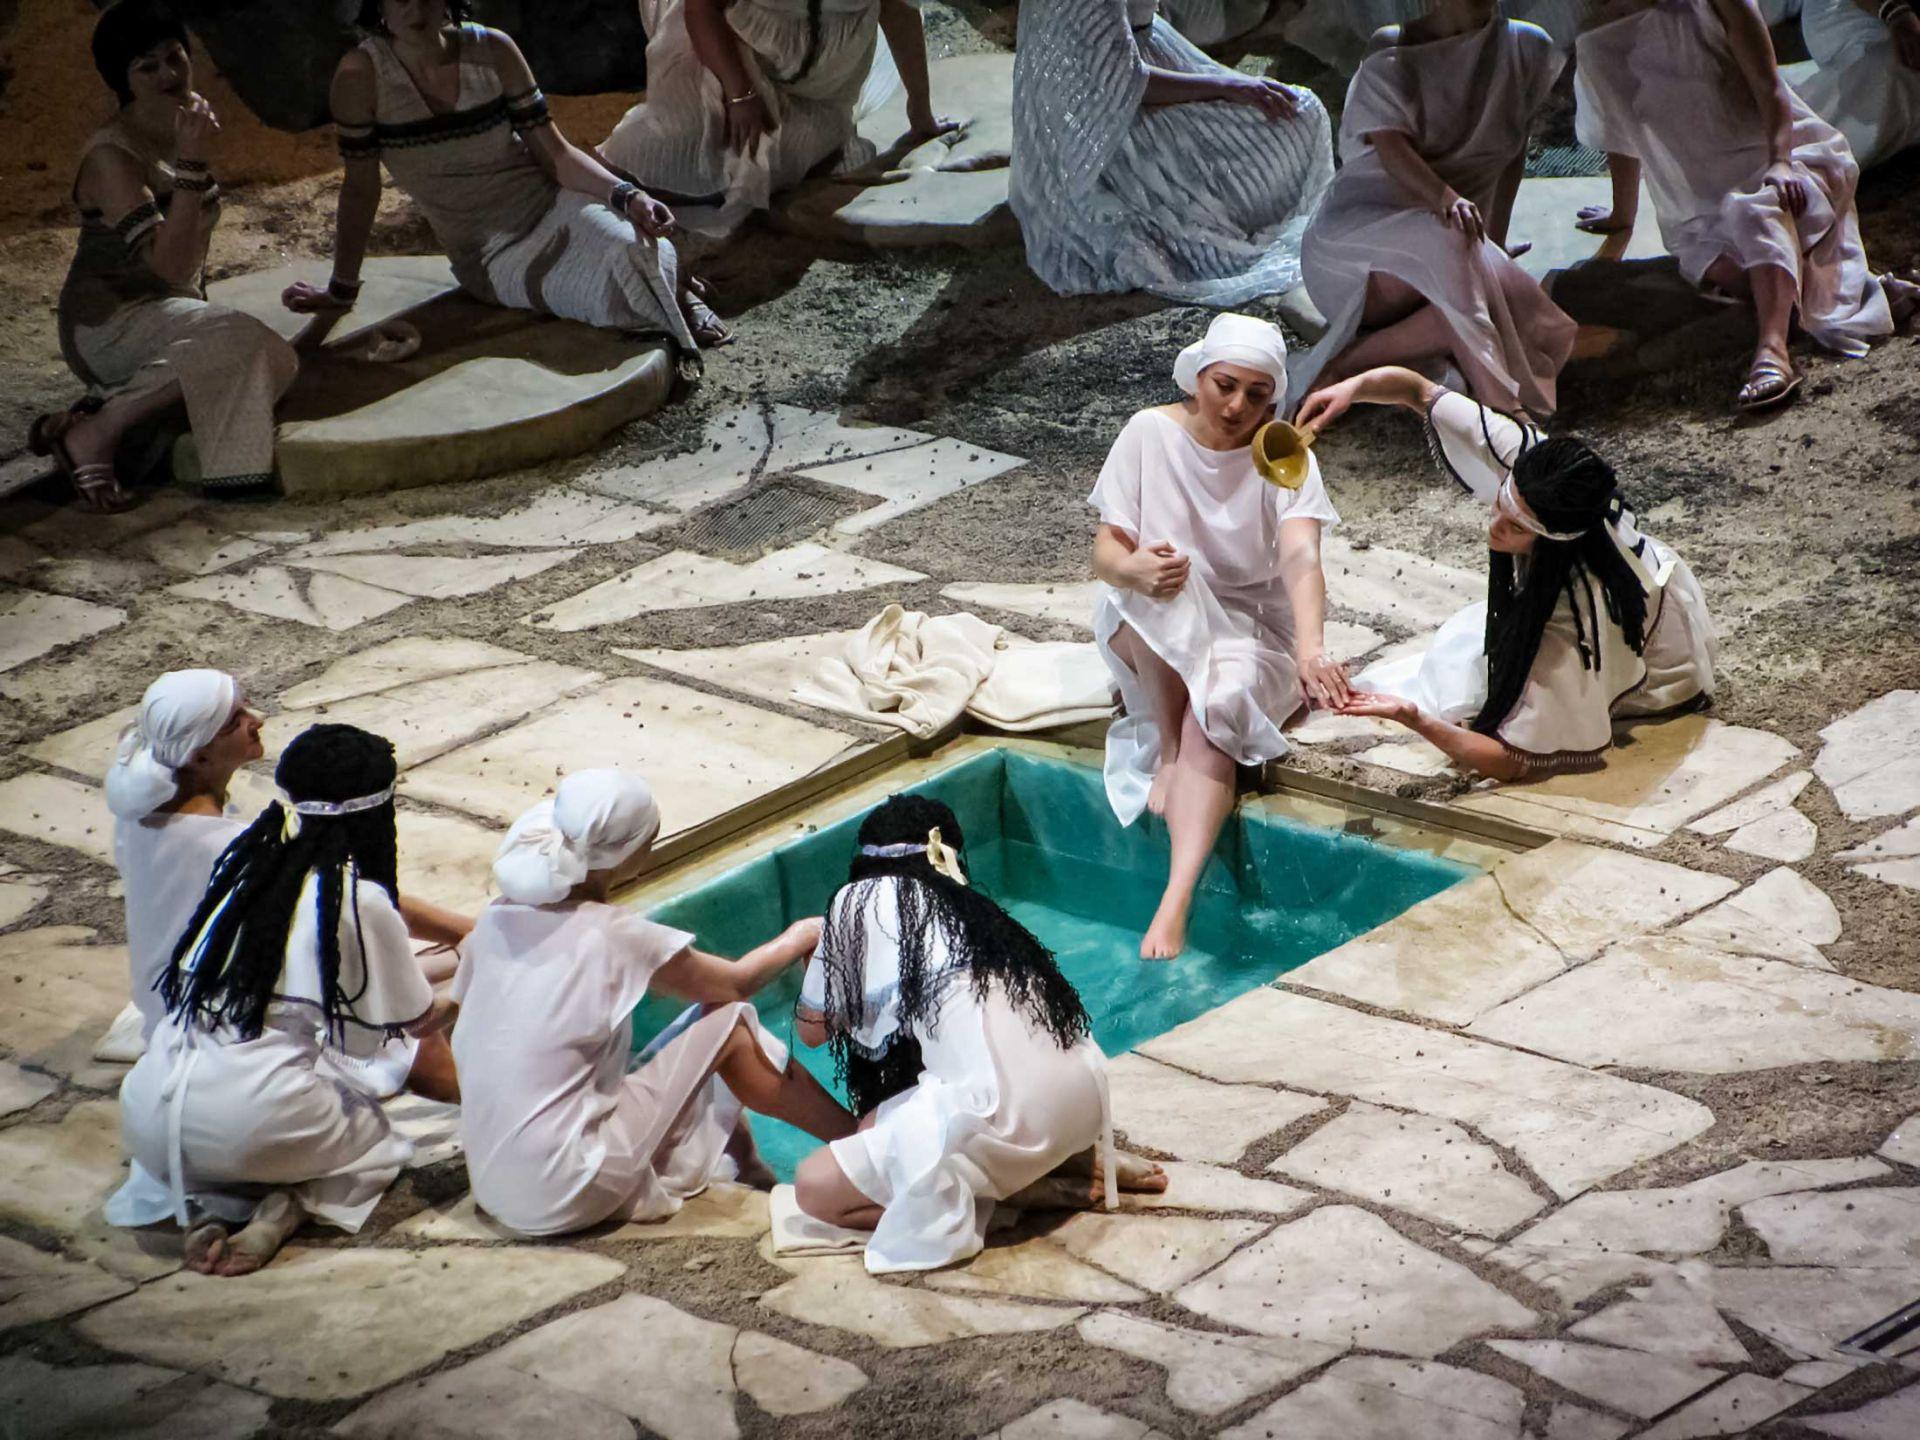 Close up of people performing at aida opera looking at giant spa prop.